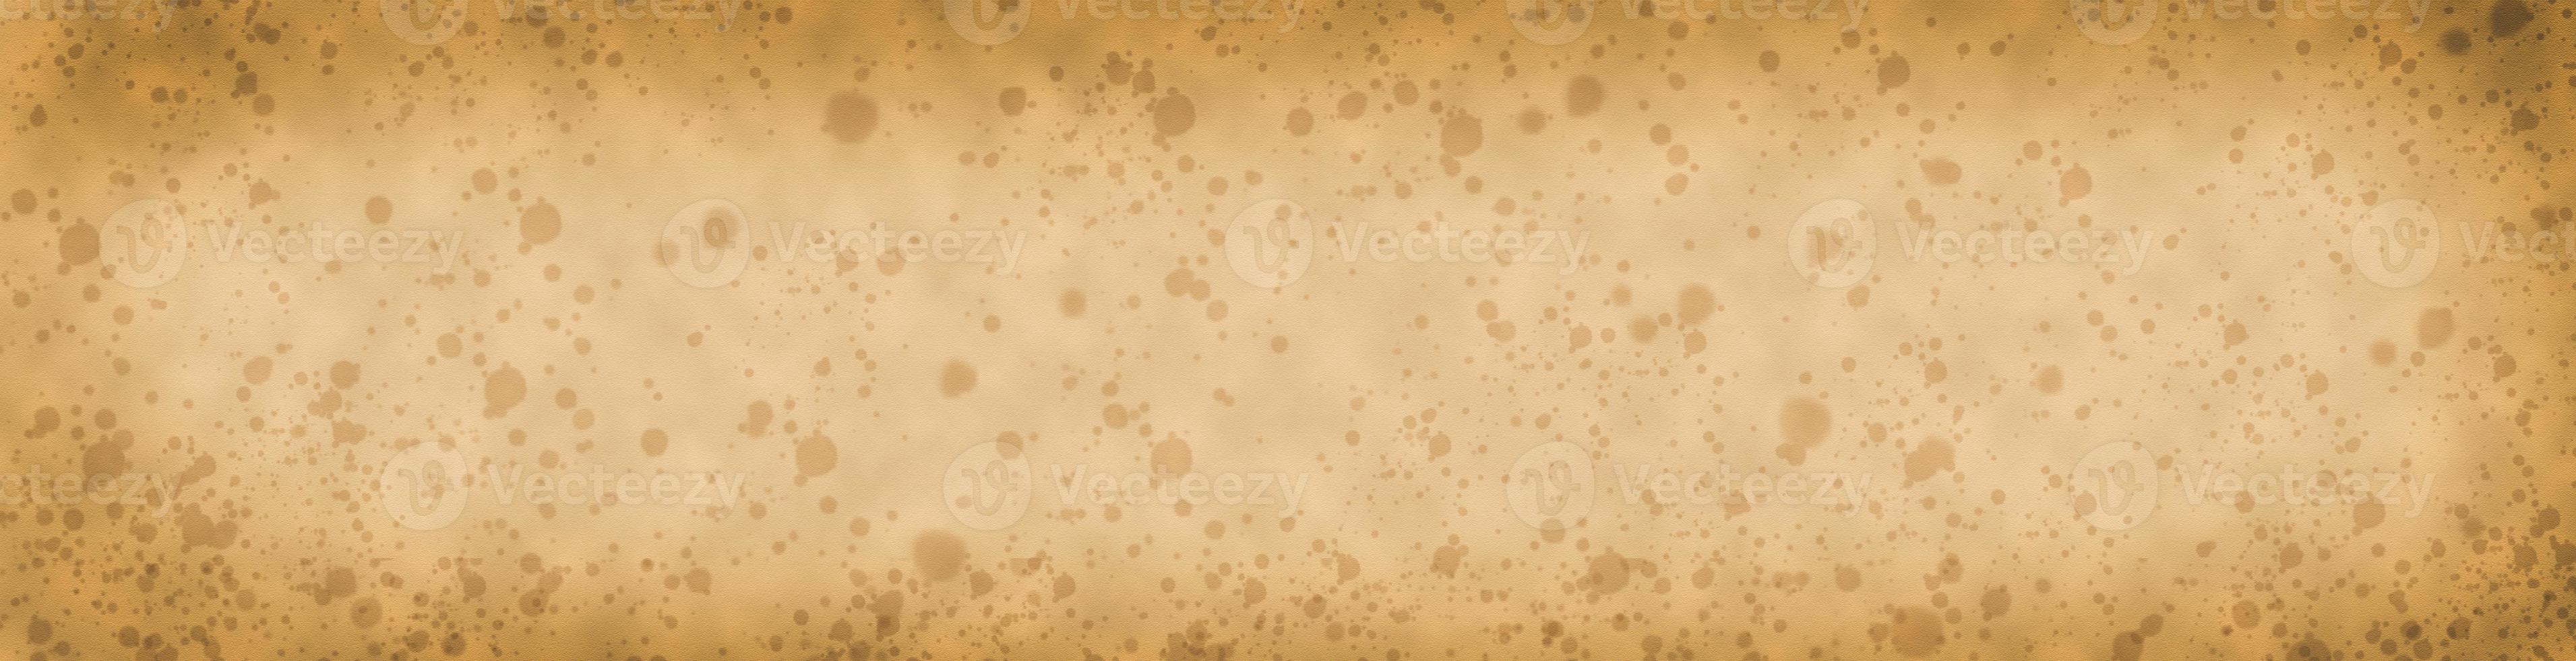 textura papel banner fundo foto